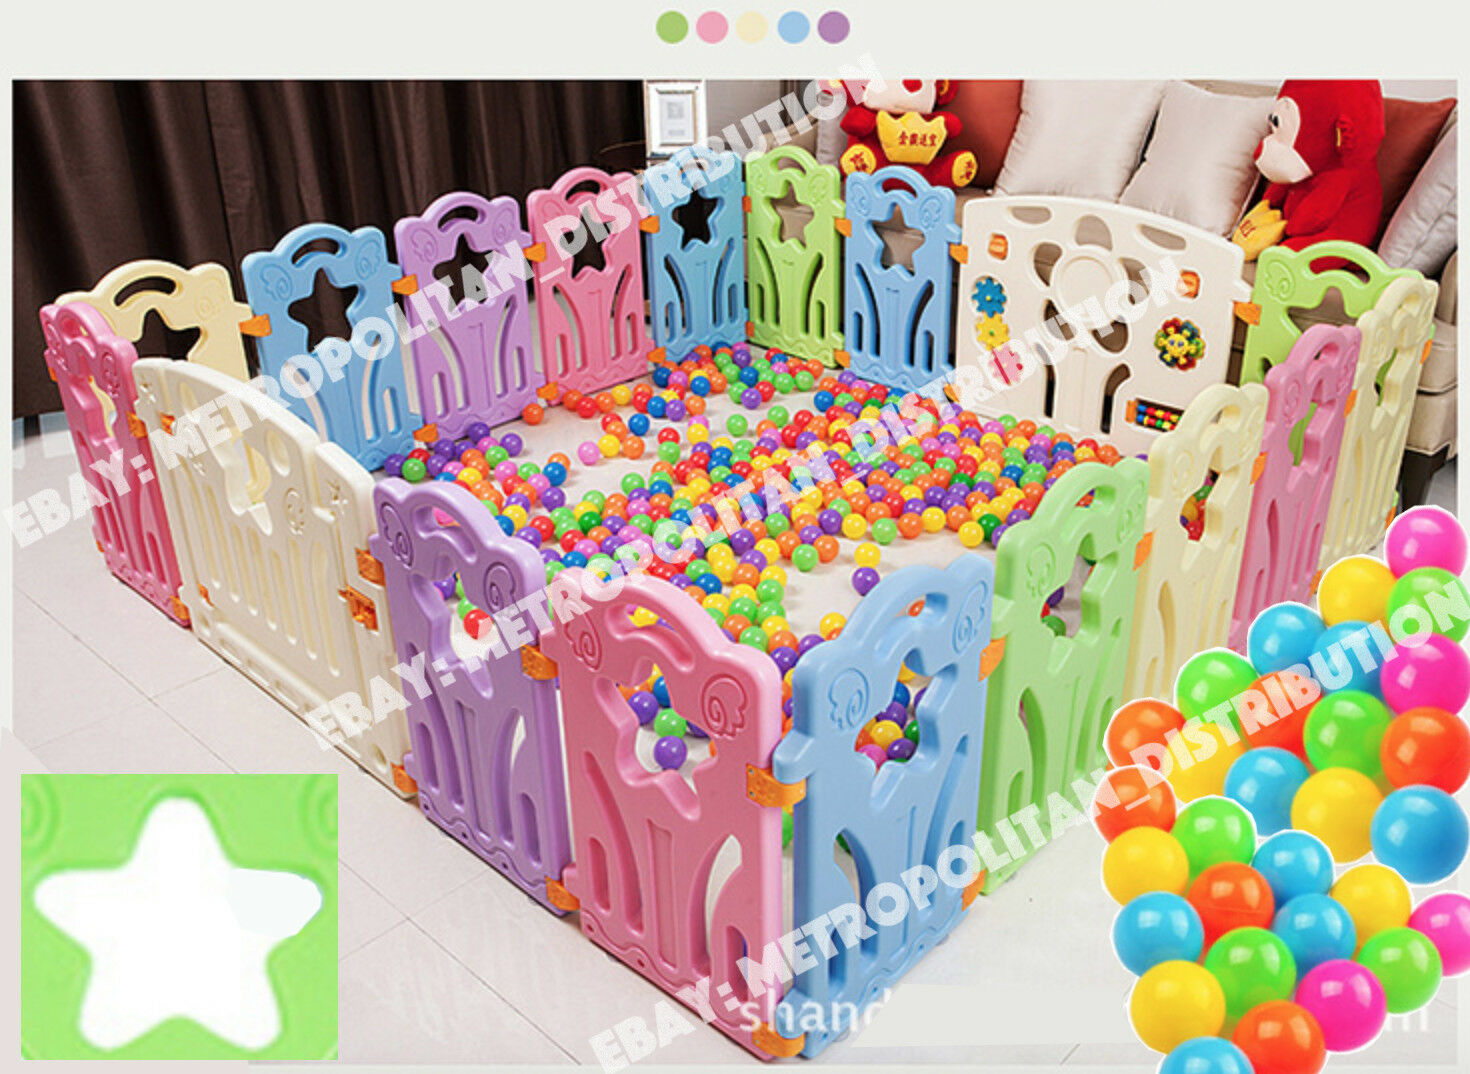 STAR 18Piece playpen+100 ball,foldable Kid/children/baby Room Divider/fence/zone